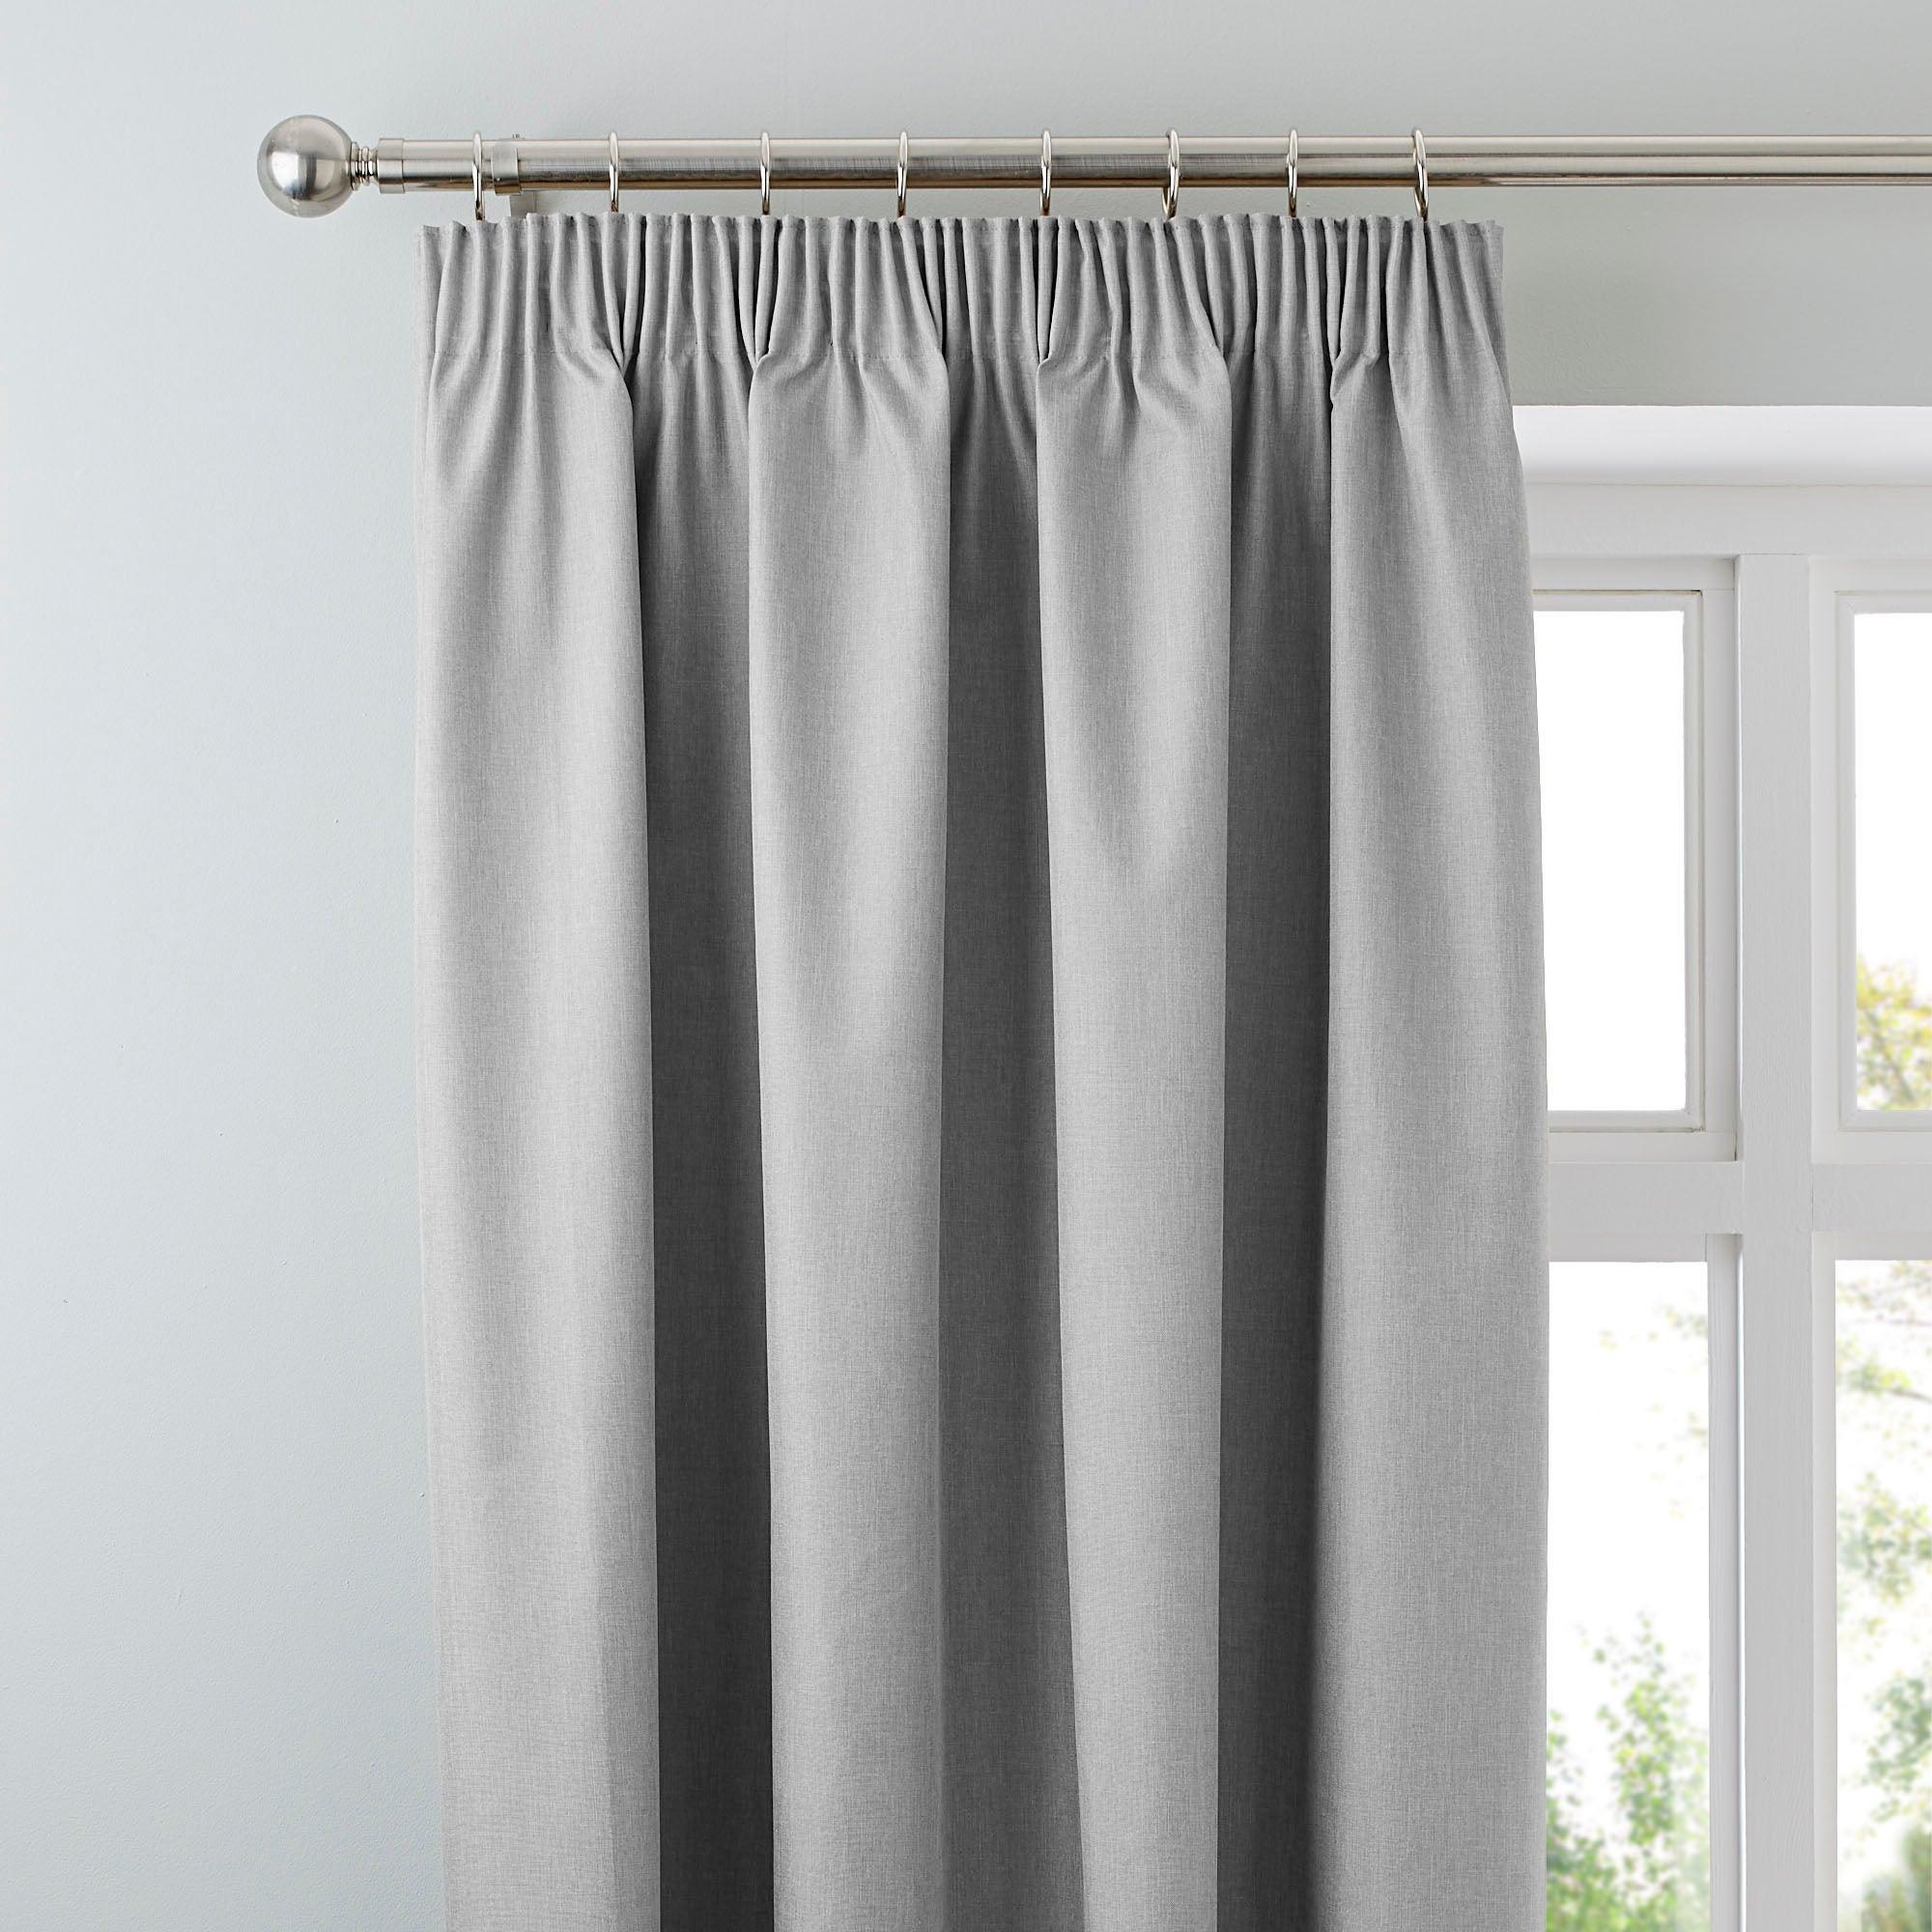 Photo of Arizona soft grey blackout pencil pleat curtains grey